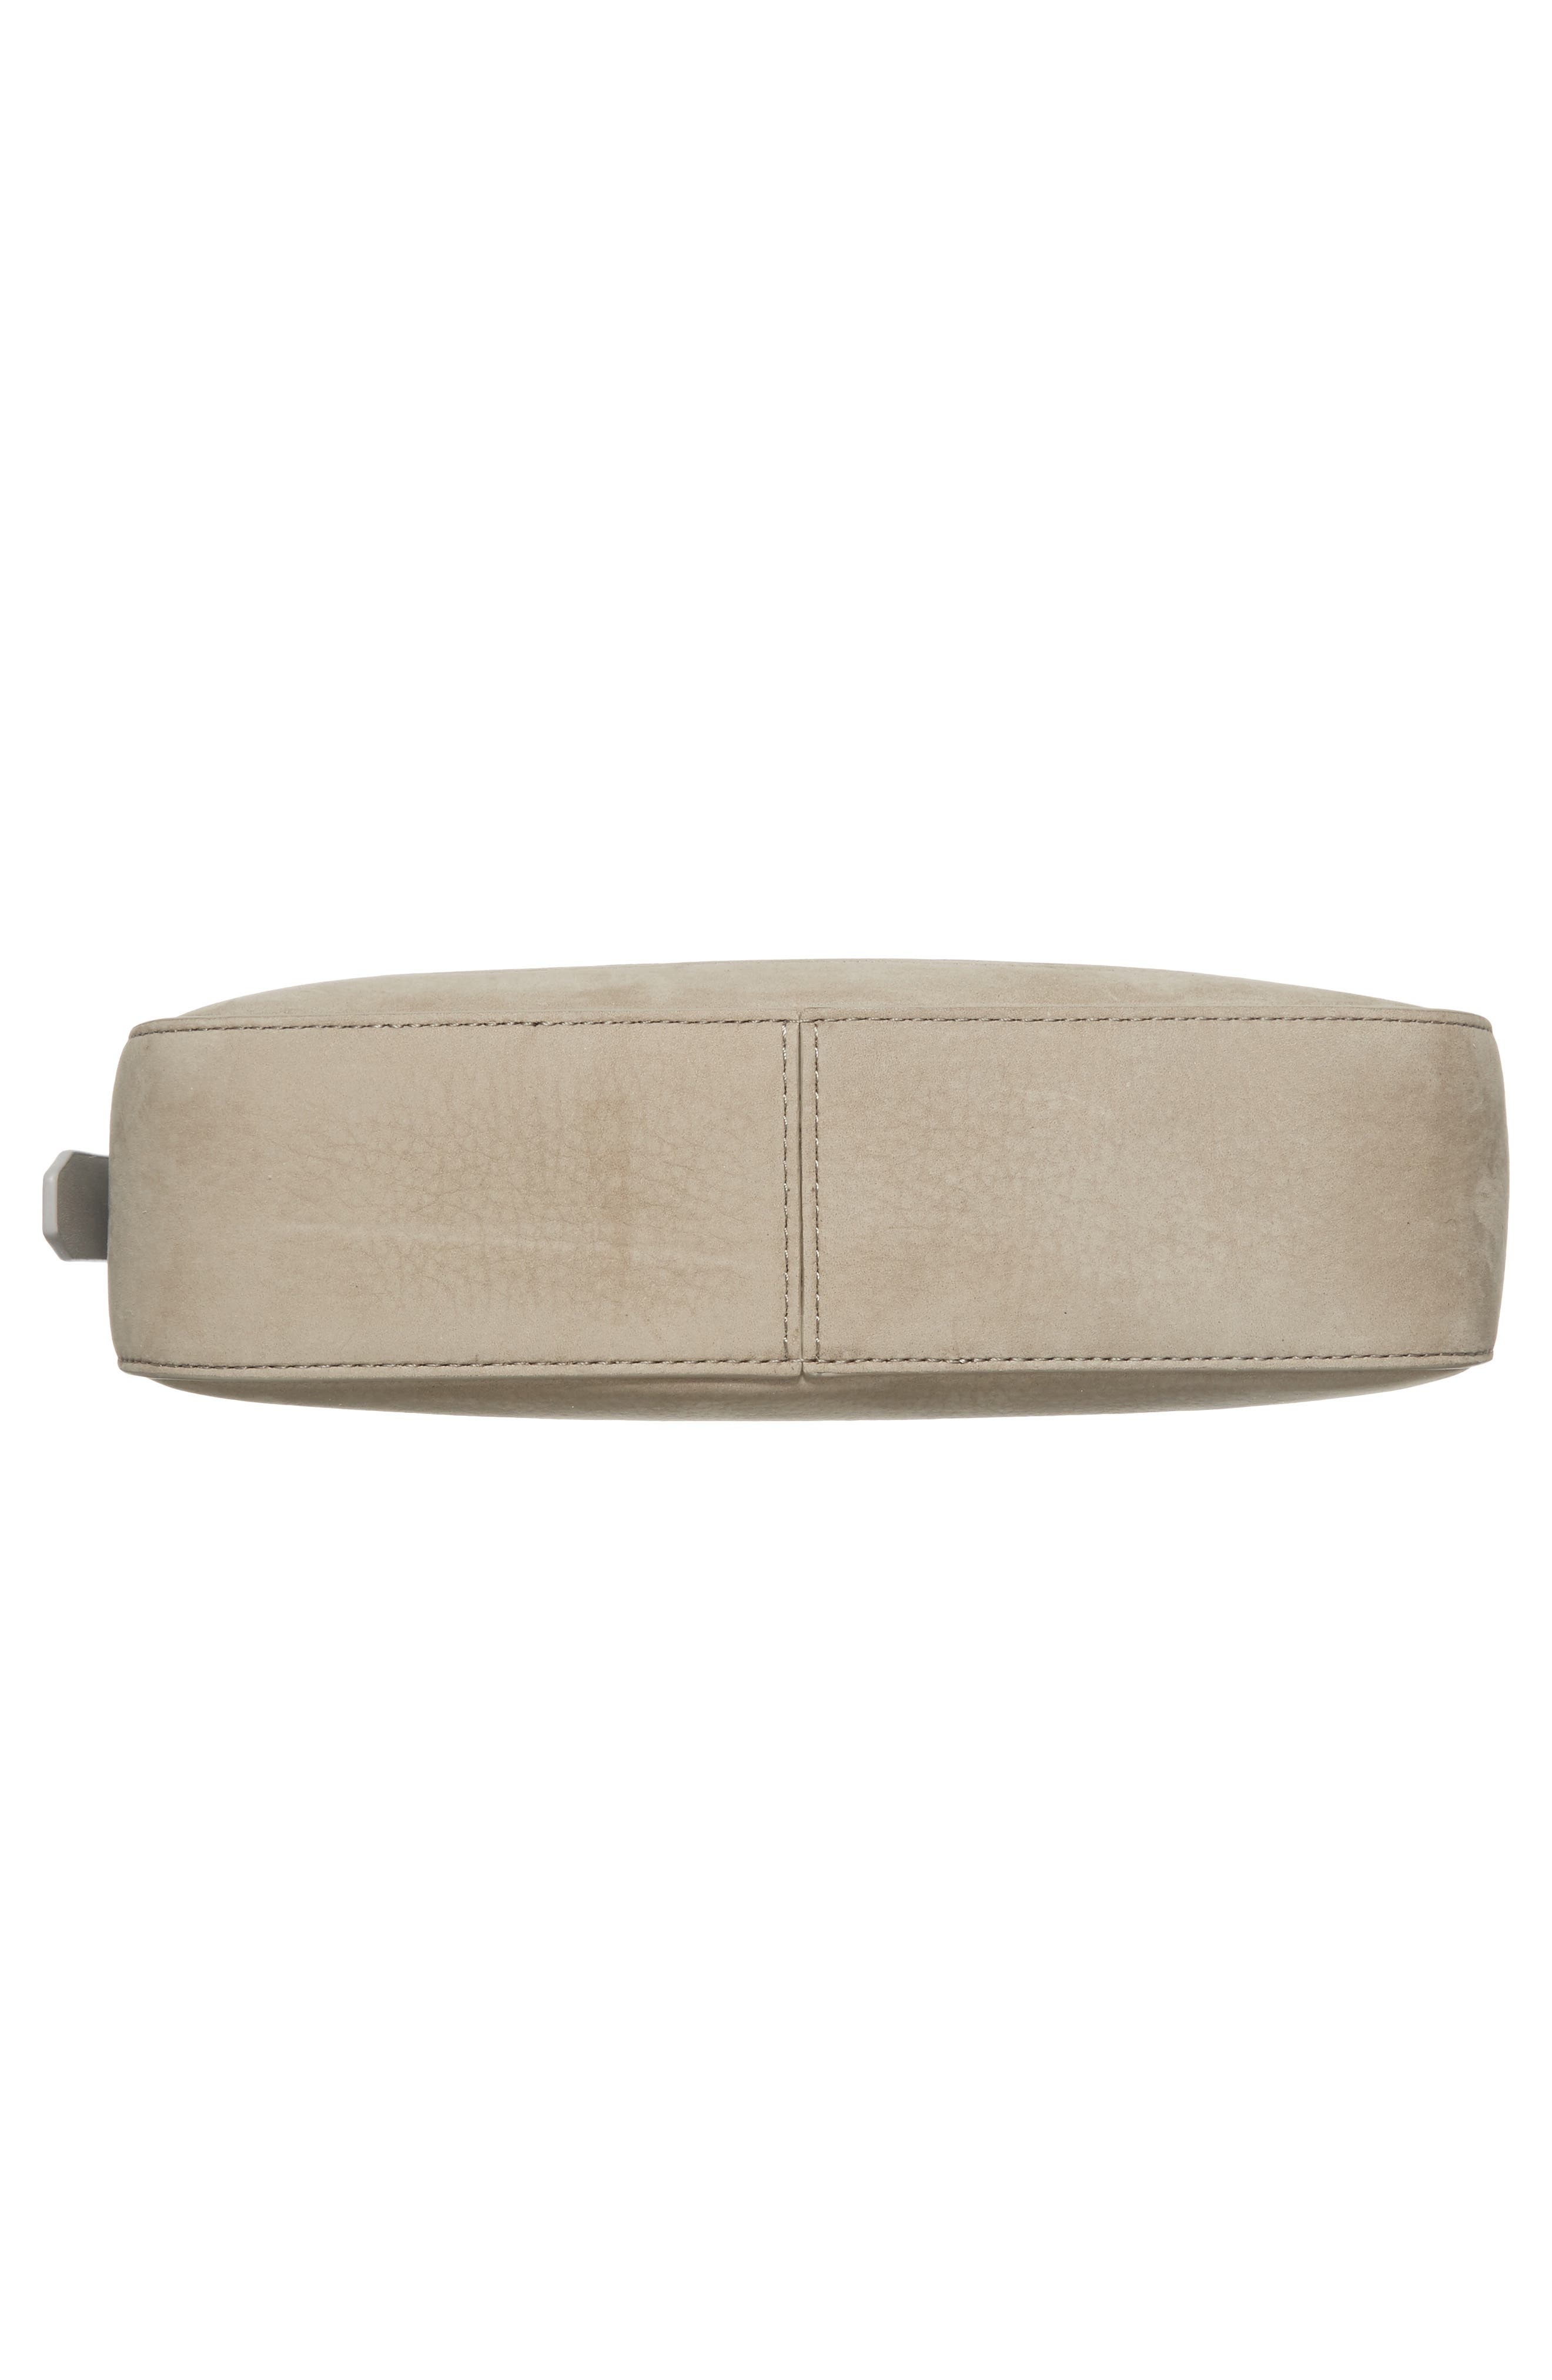 Cooper Nubuck Leather Shoulder Bag,                             Alternate thumbnail 6, color,                             Light Cement Grey